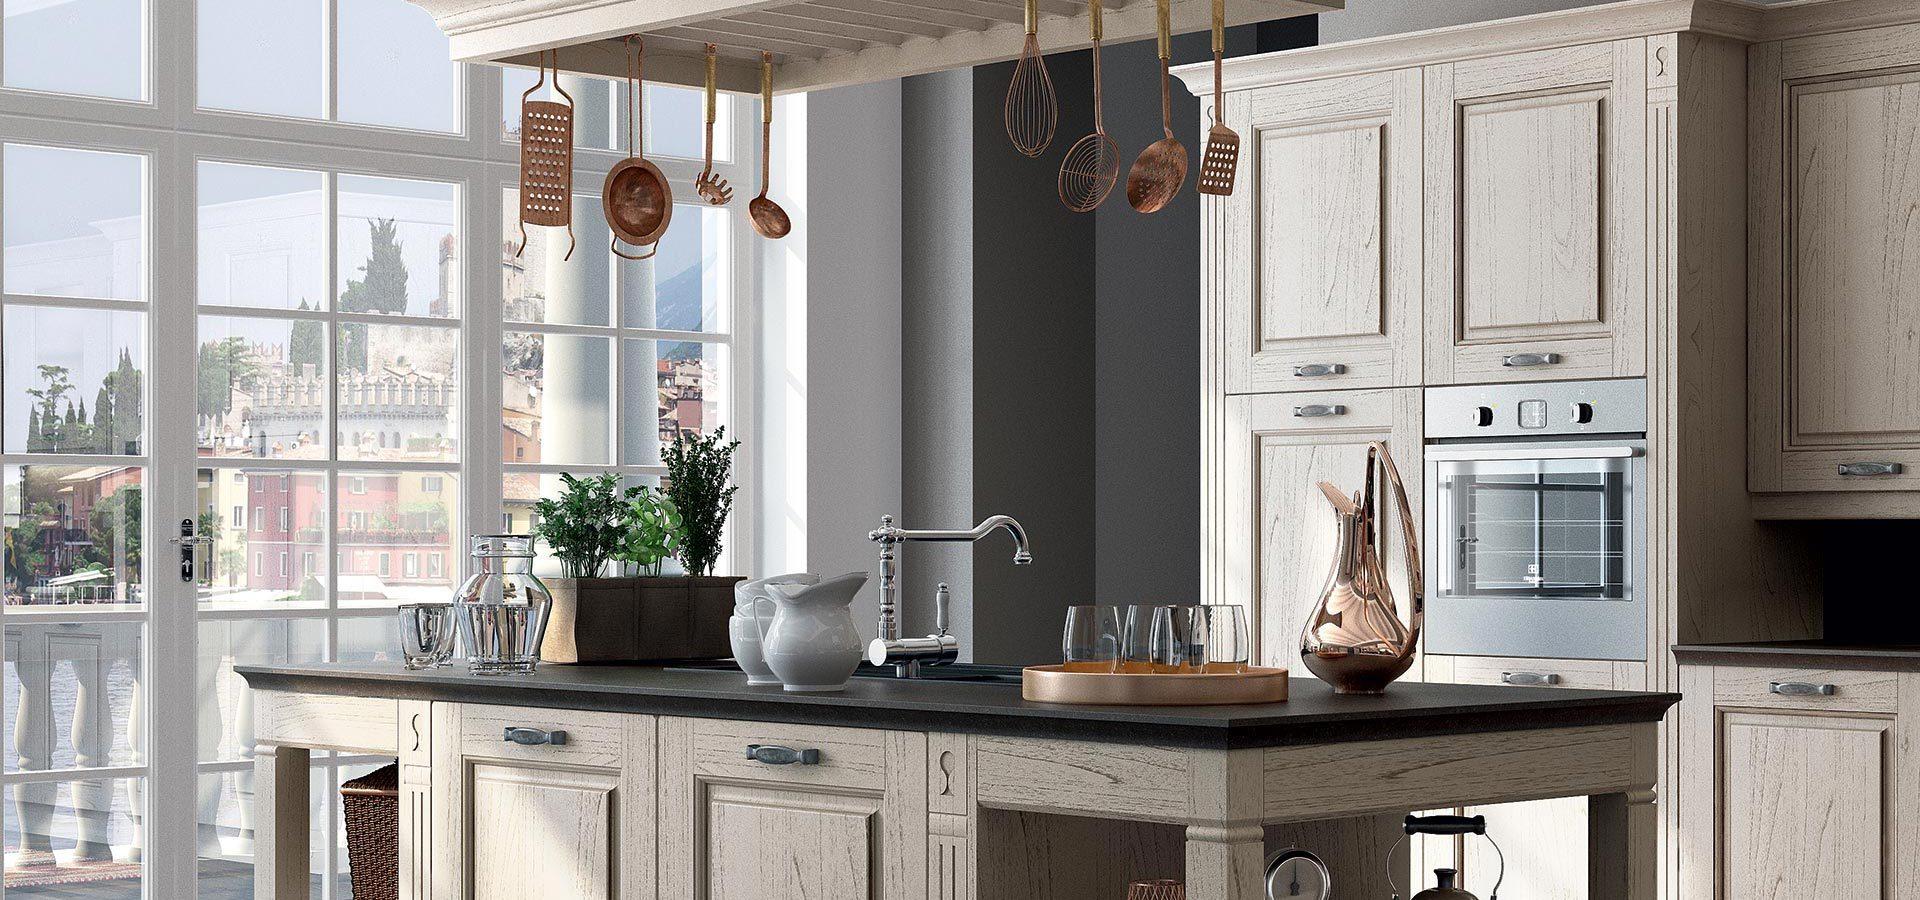 Cucine a verona simple cucina country in legno su misura - Cucine su misura modena ...